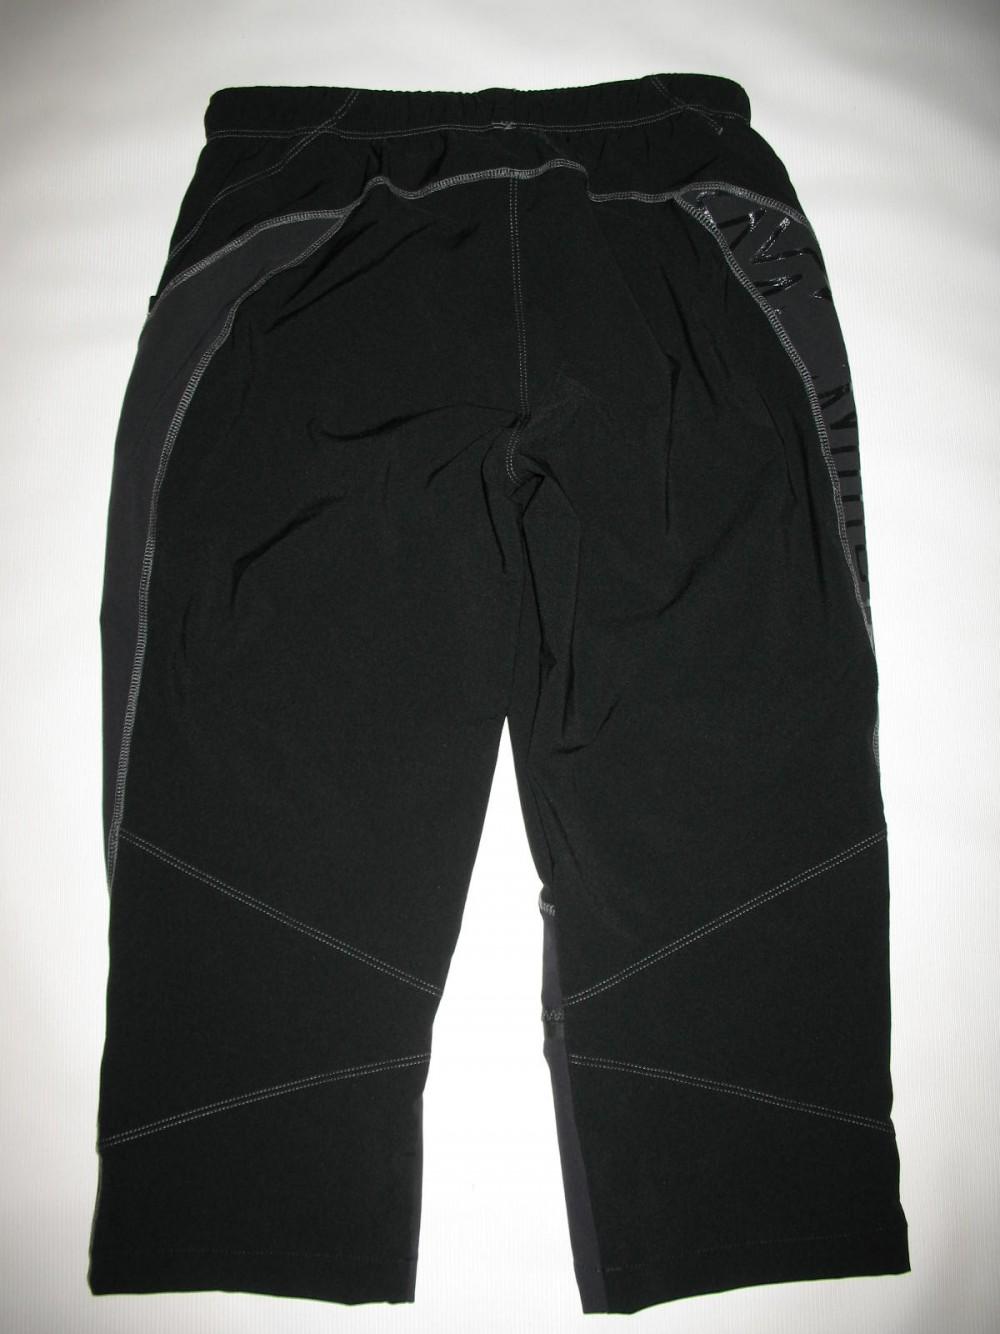 Шорты MONTURA free synt up 34 climbing shorts (размер M/S) - 4